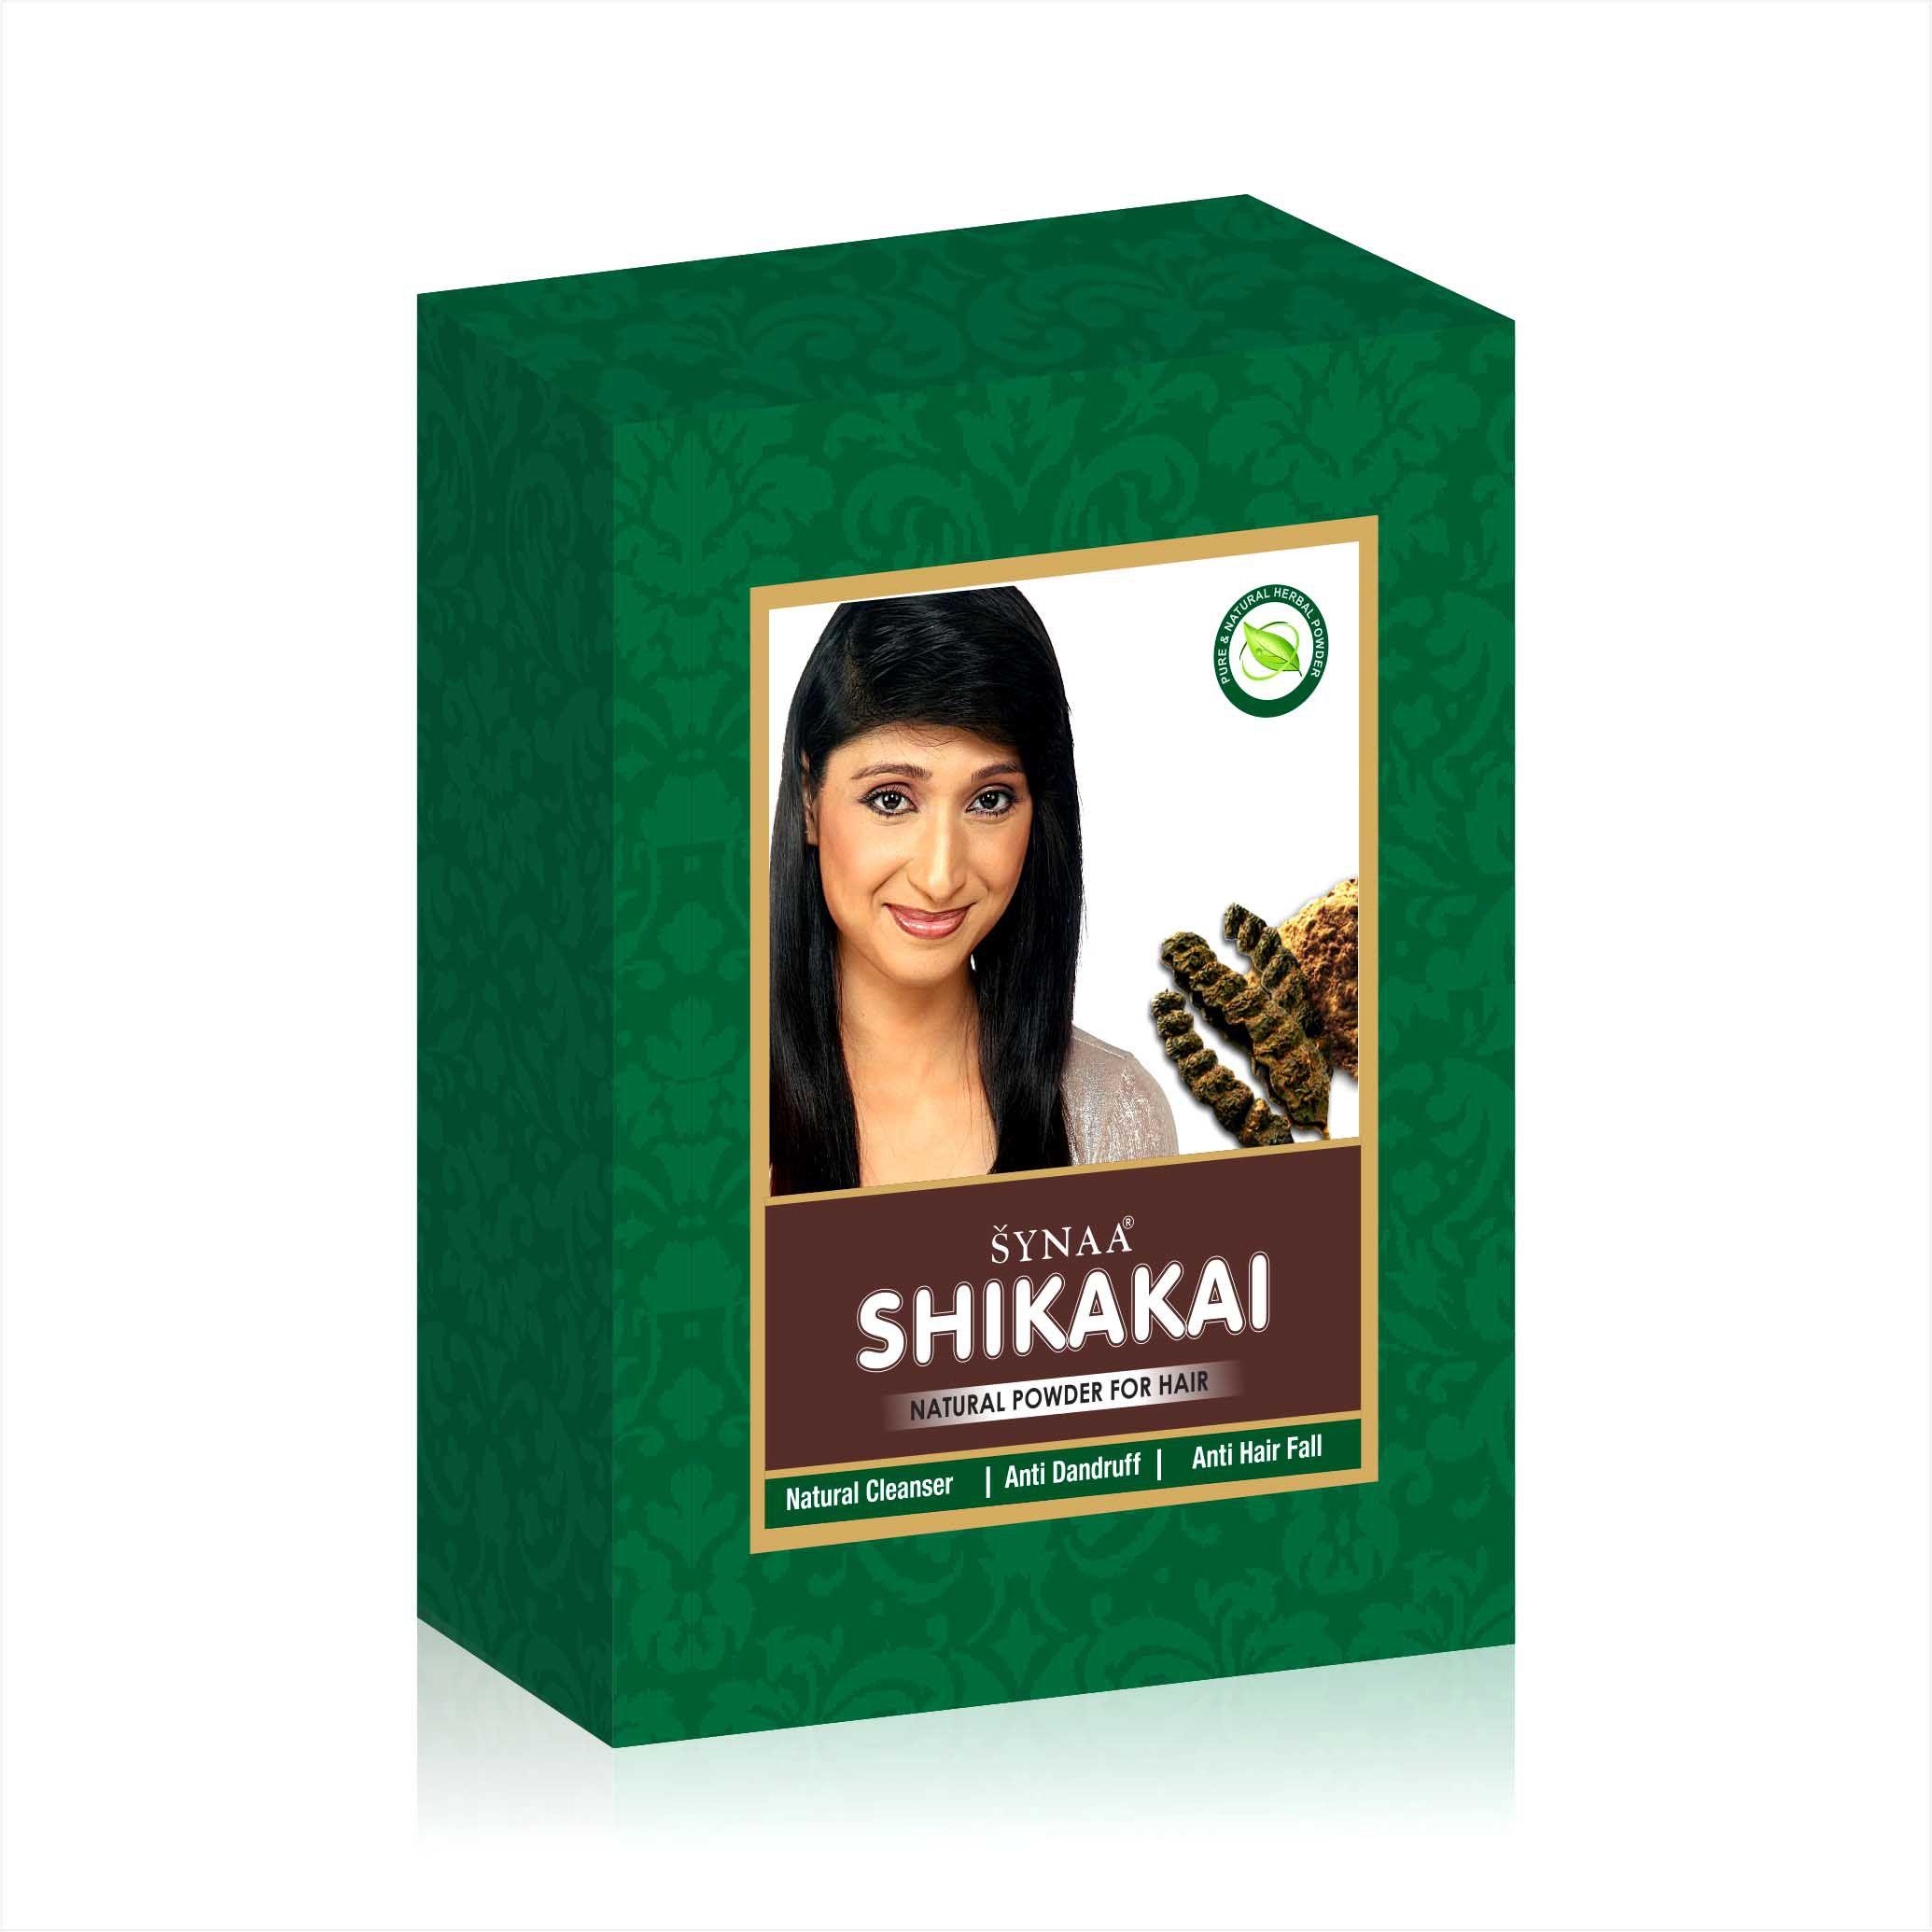 Synaa Shikakai Powder Herbal Powder for Hair Care (100g)